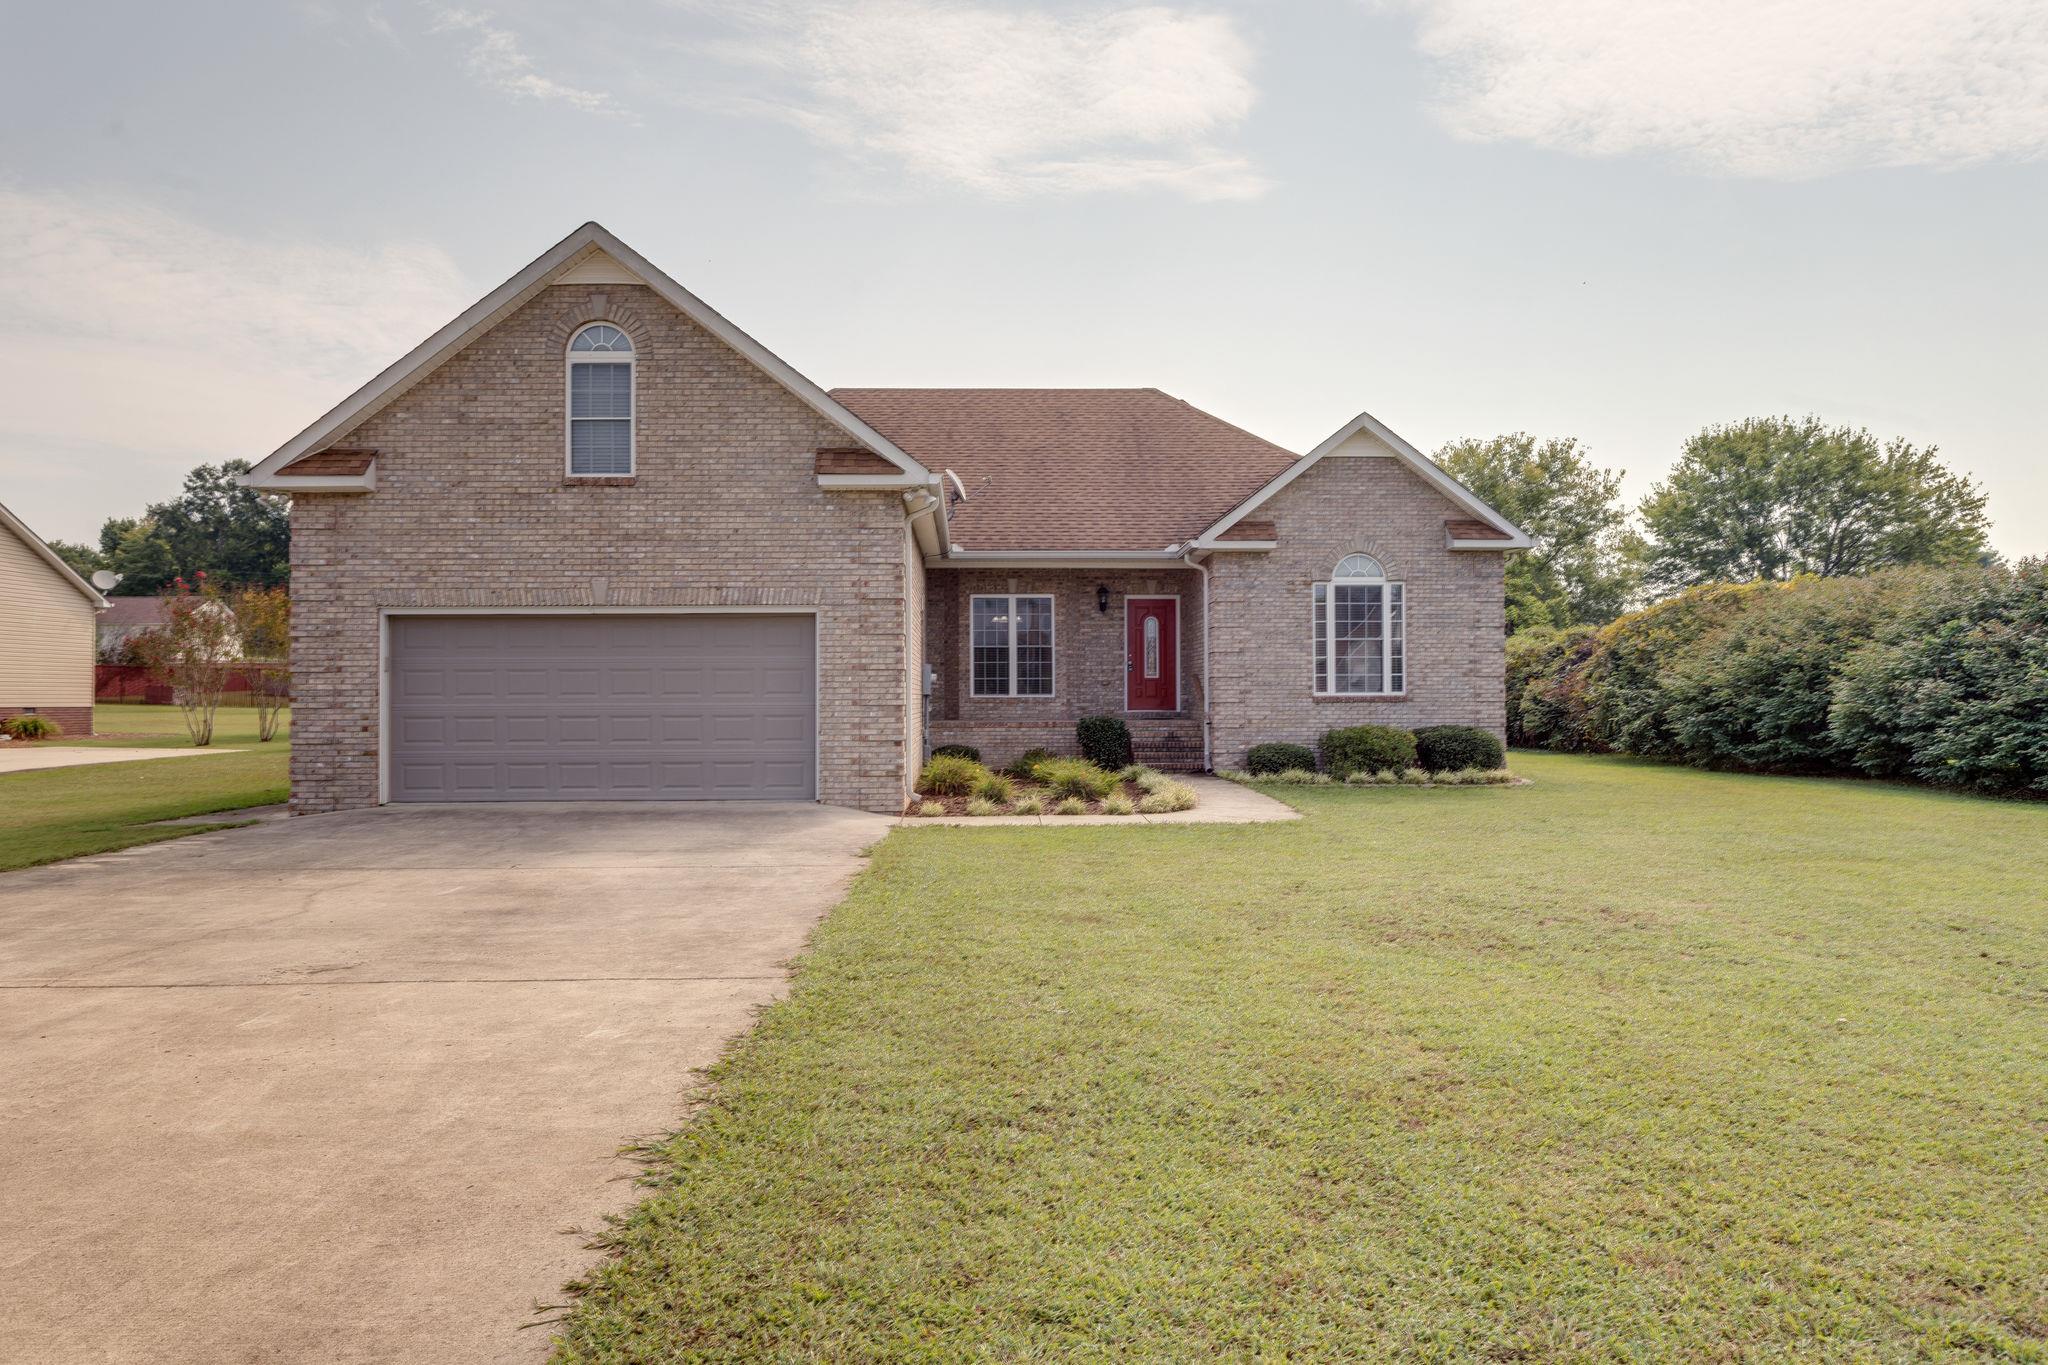 226 Lakeview Dr, Decherd, TN 37324 - Decherd, TN real estate listing